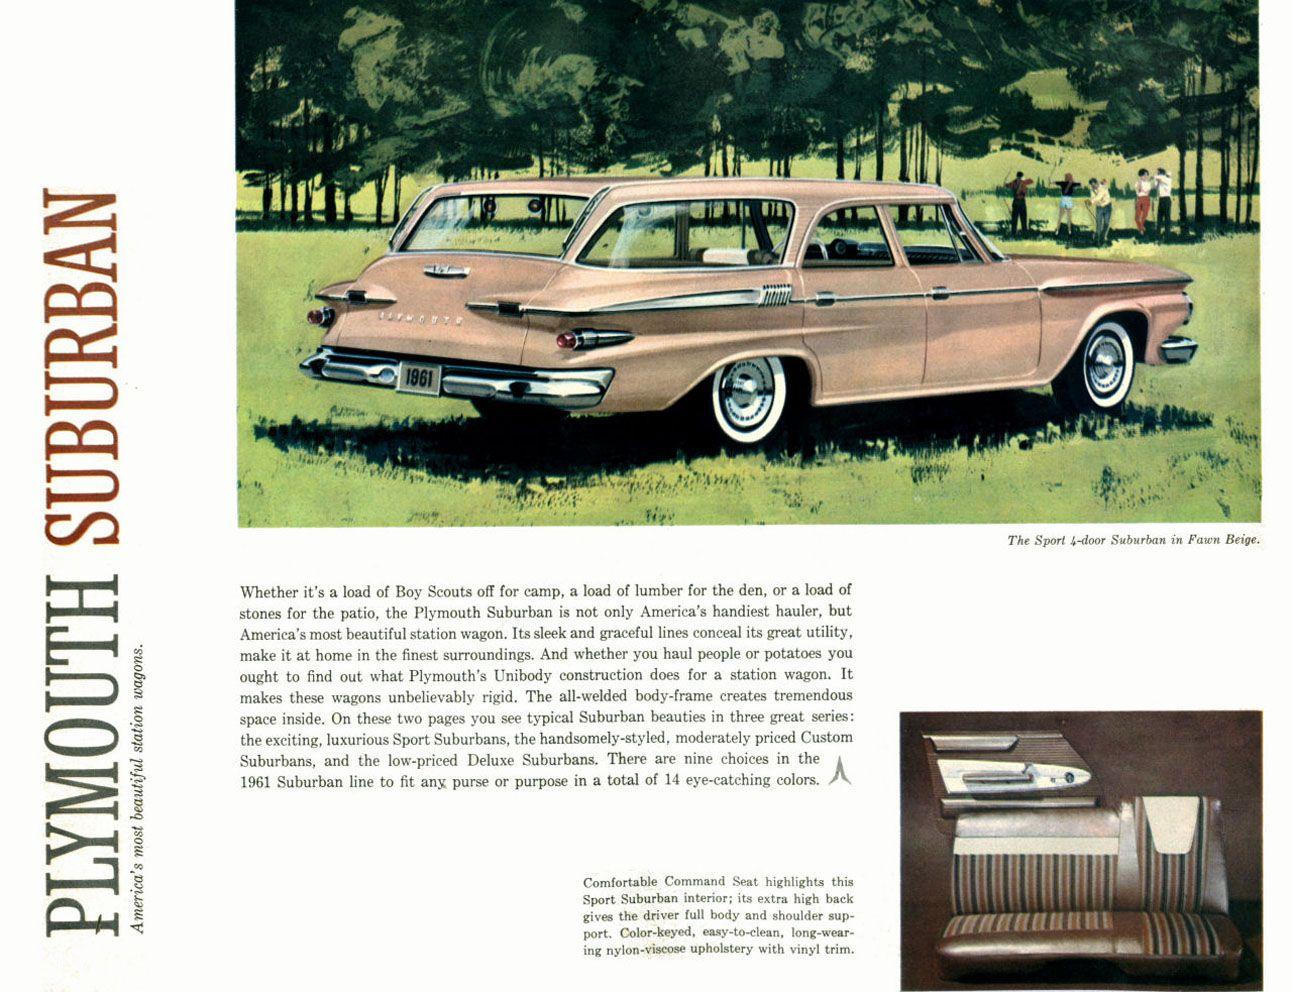 1961 plymouth suburban station wagon station wagon